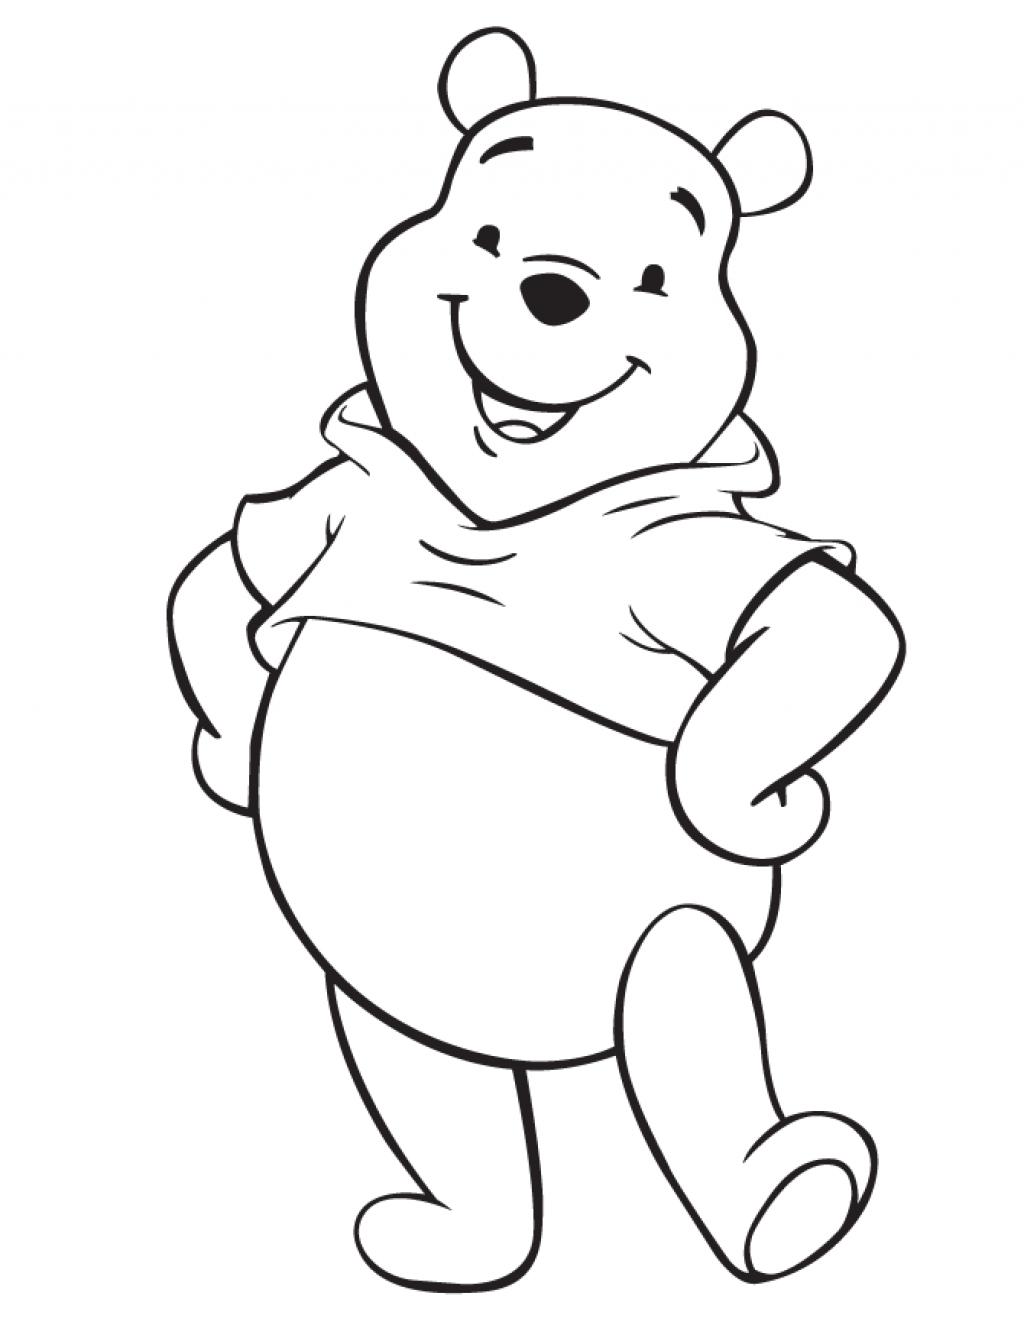 cute cartoon characters drawing at getdrawings com free for